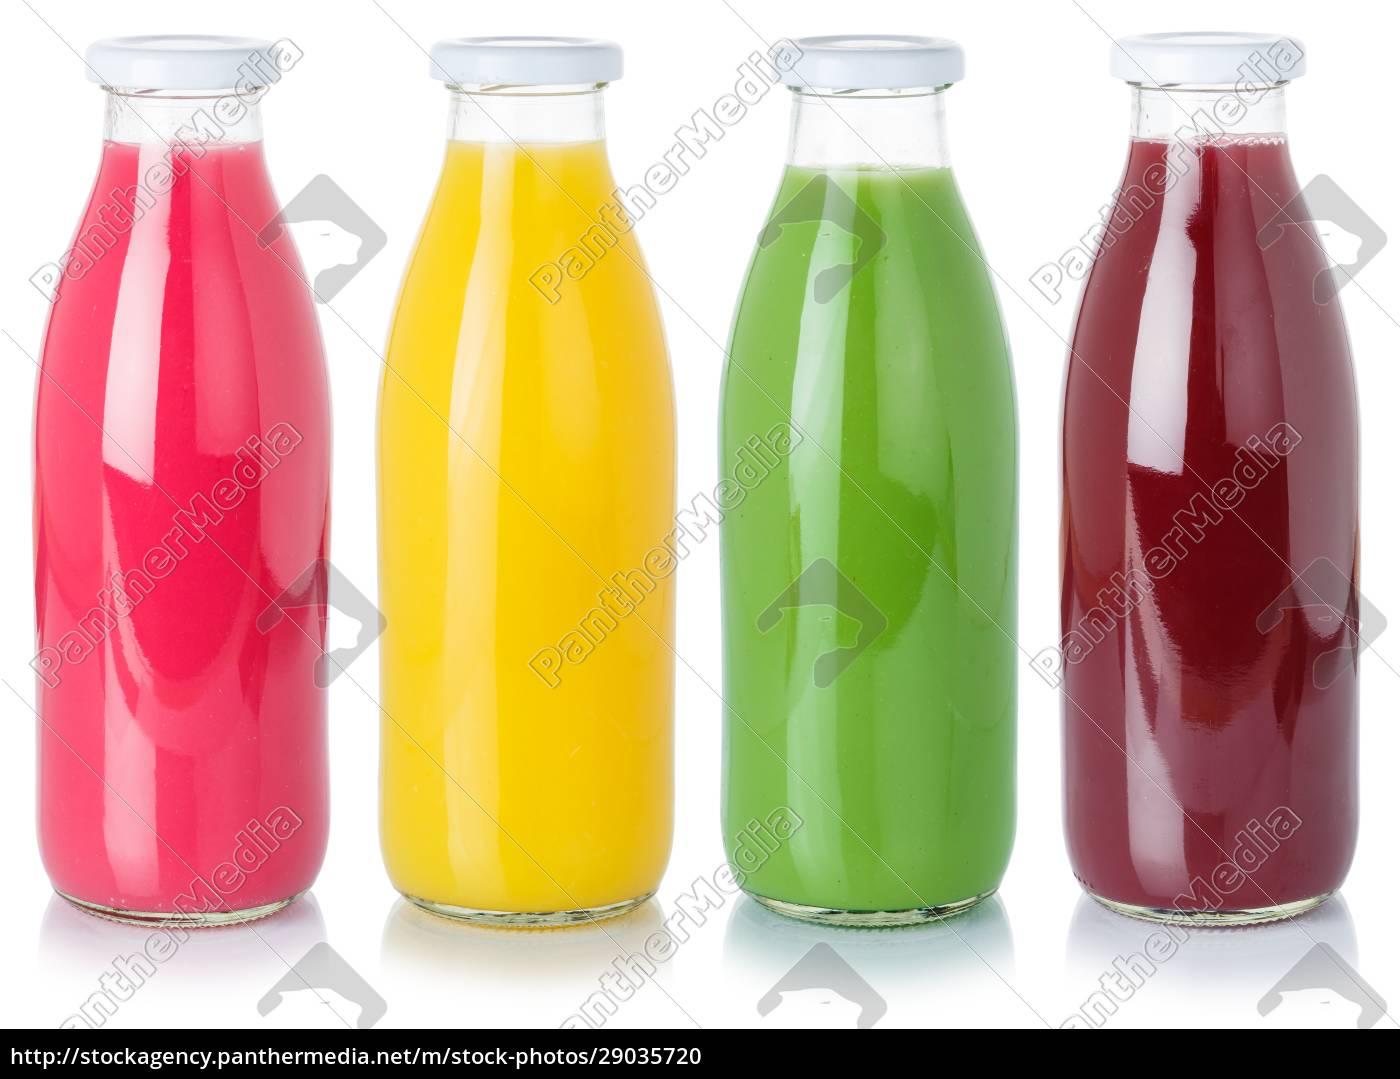 bebidas, de, zumo, de, fruta, fresca - 29035720